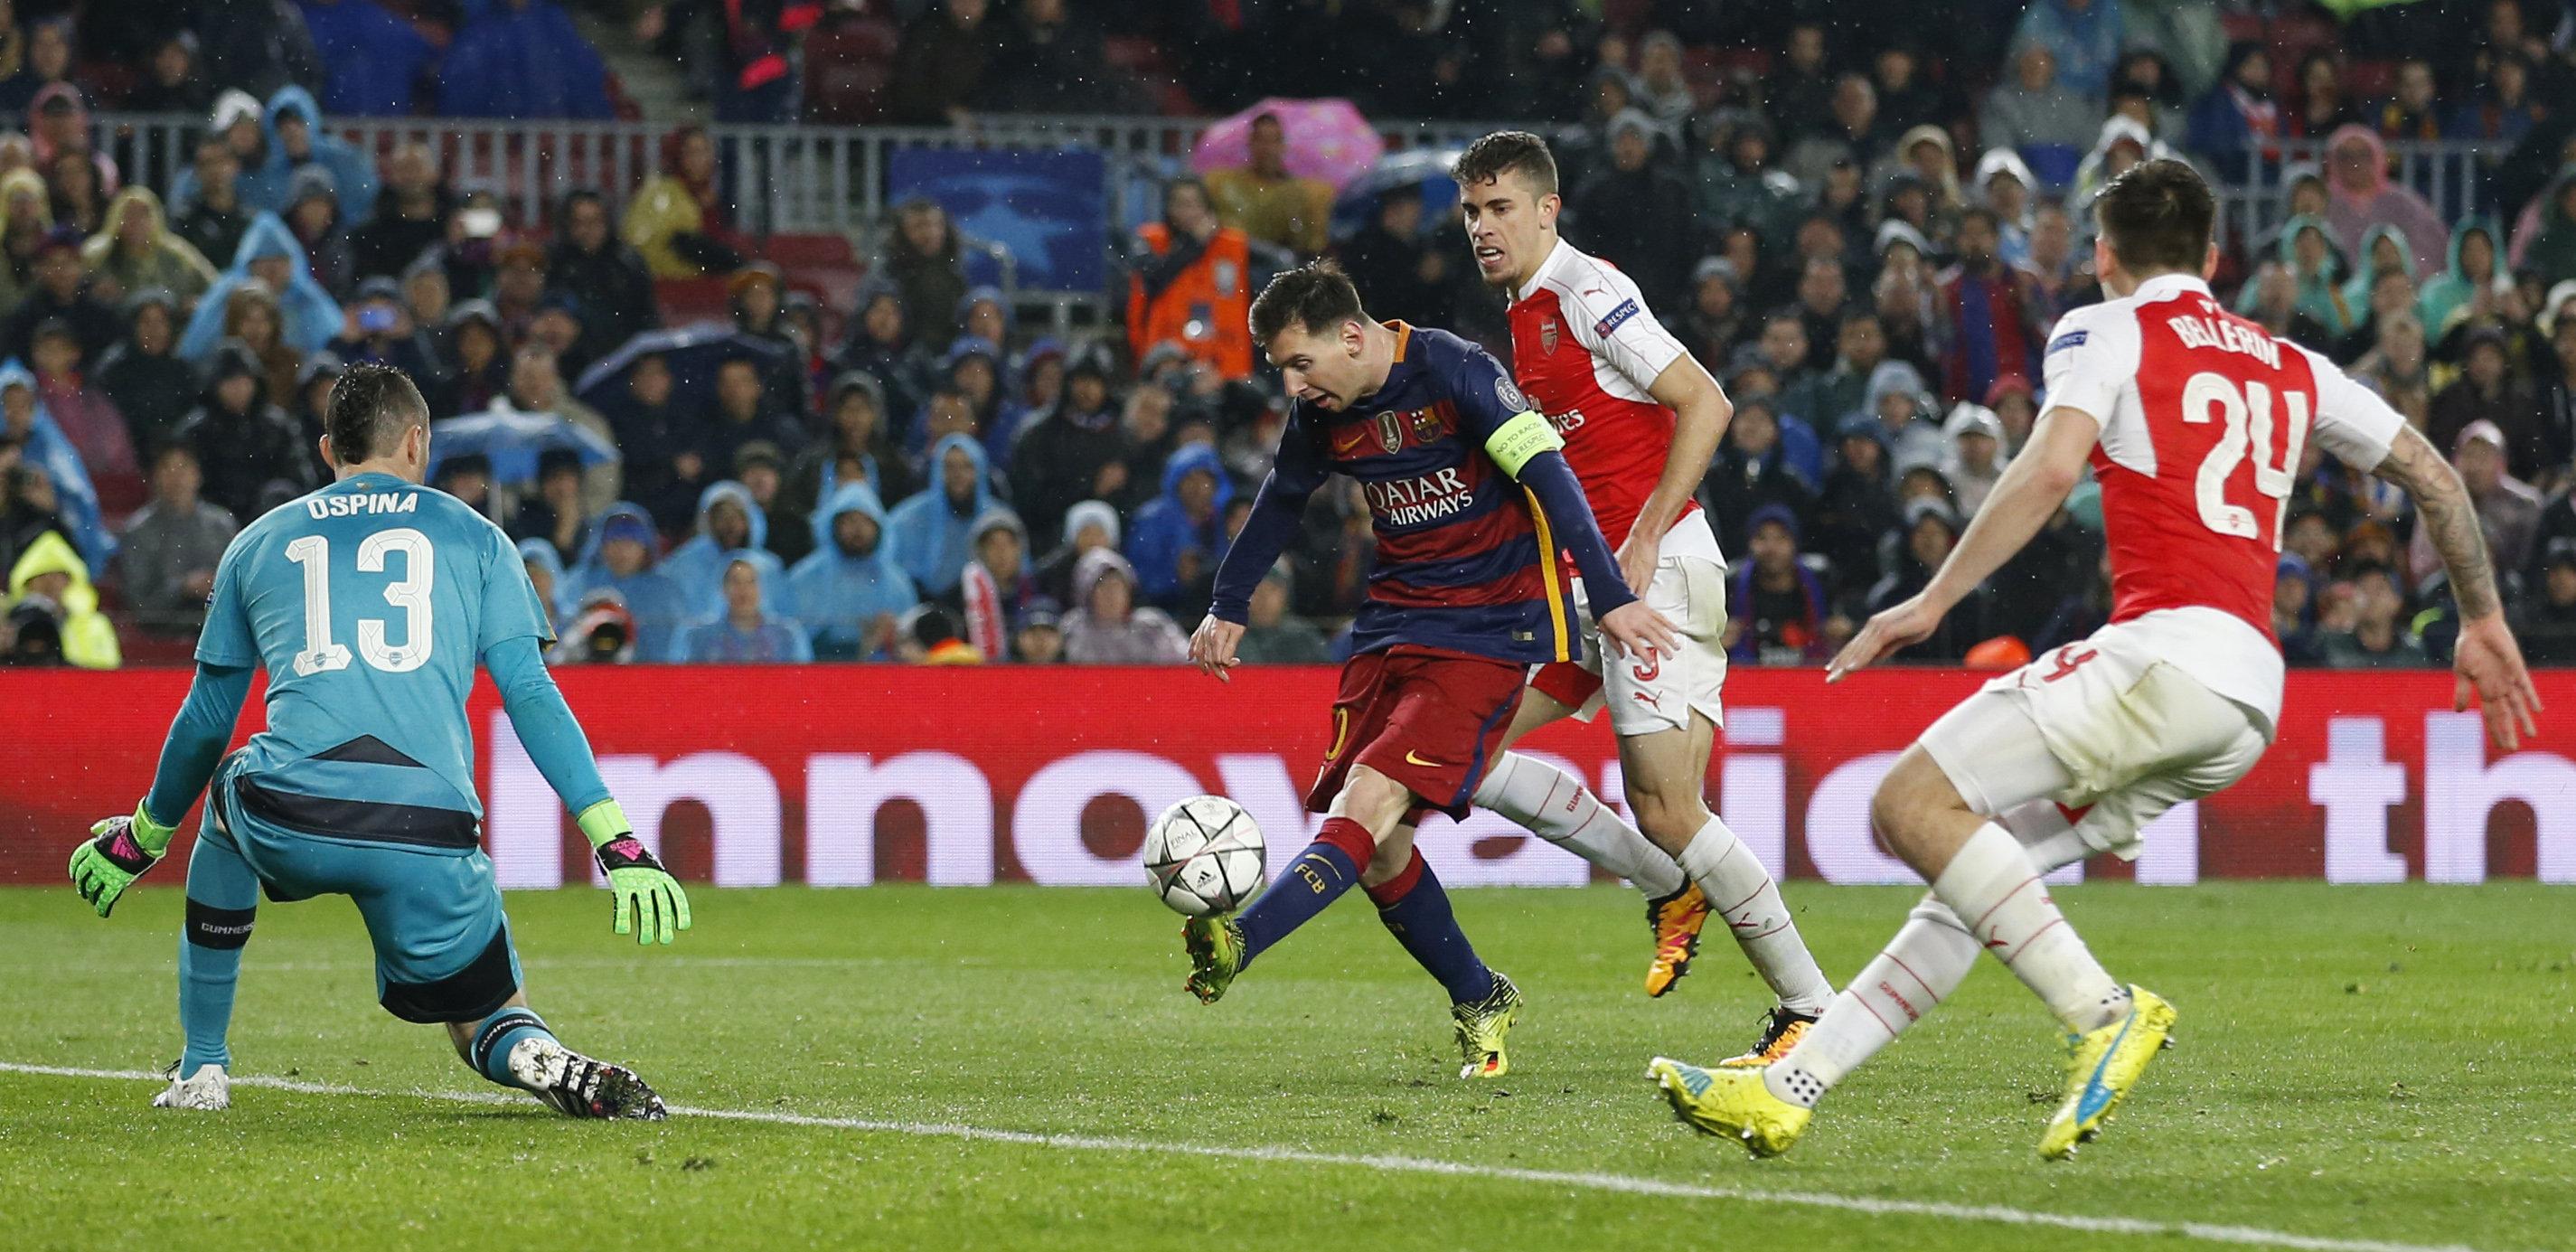 Матч Барселона - Арсенал: удар по воротам Лионеля Месси